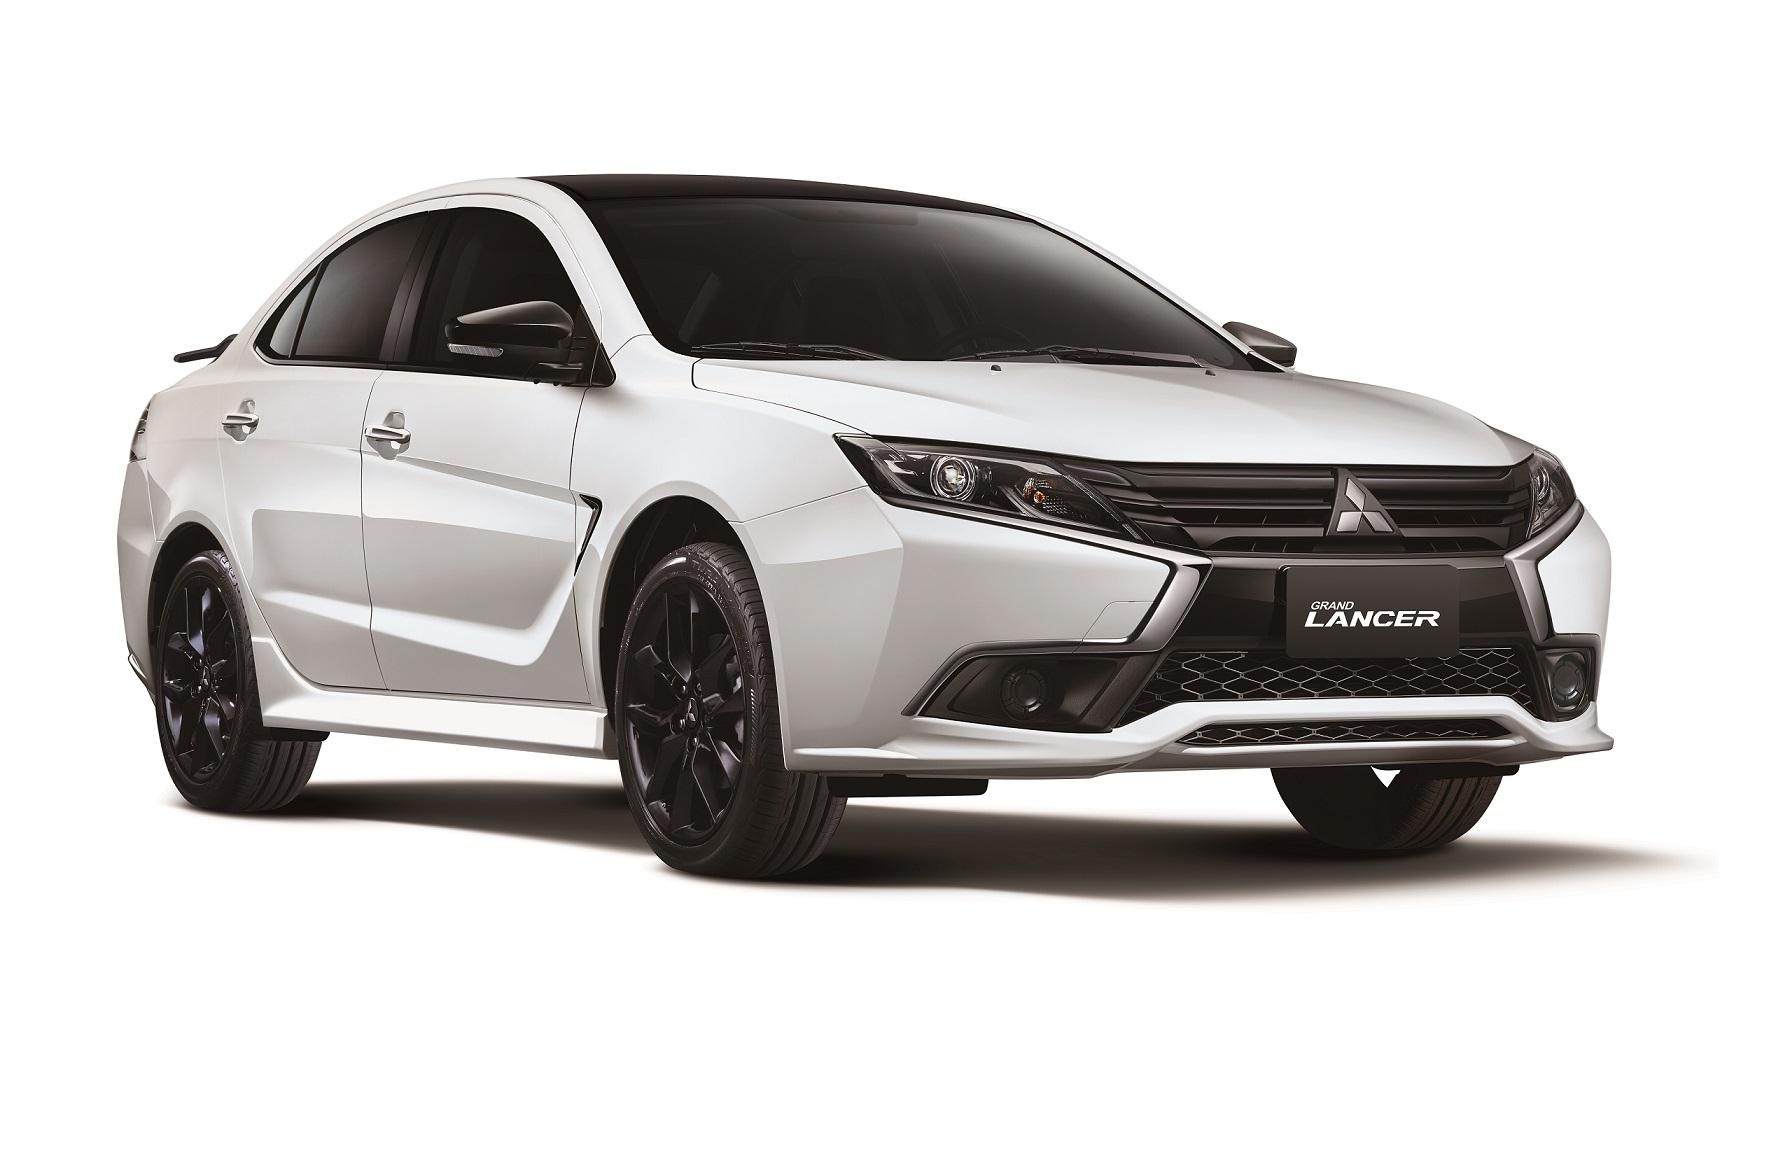 Mitsubishi Grand Lancer 本月推出 B&W 羨定版舊換新優惠只要 66.9 萬。